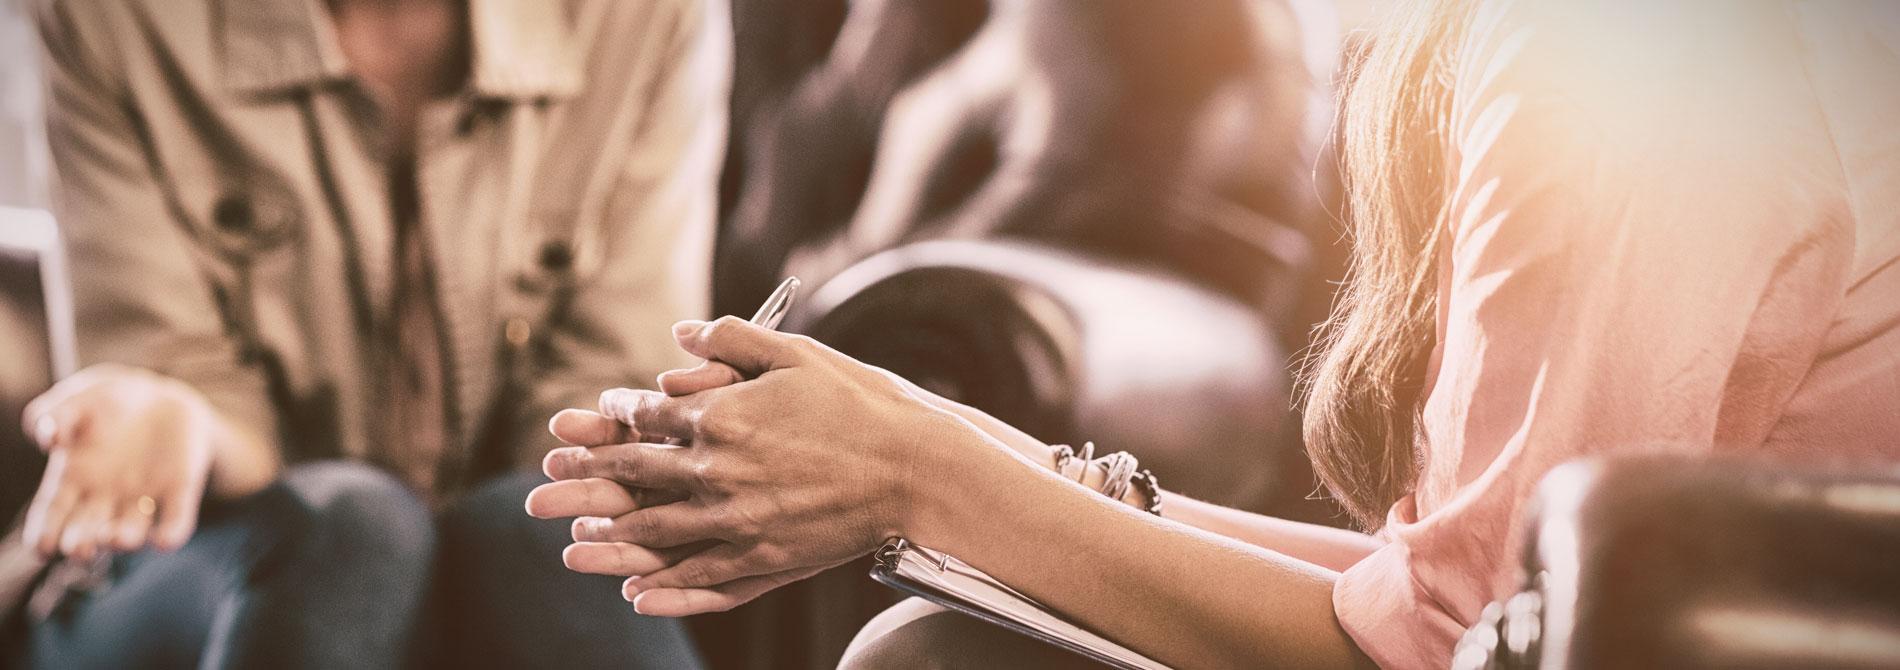 How Does Intensive Outpatient Treatment Benefit Women?